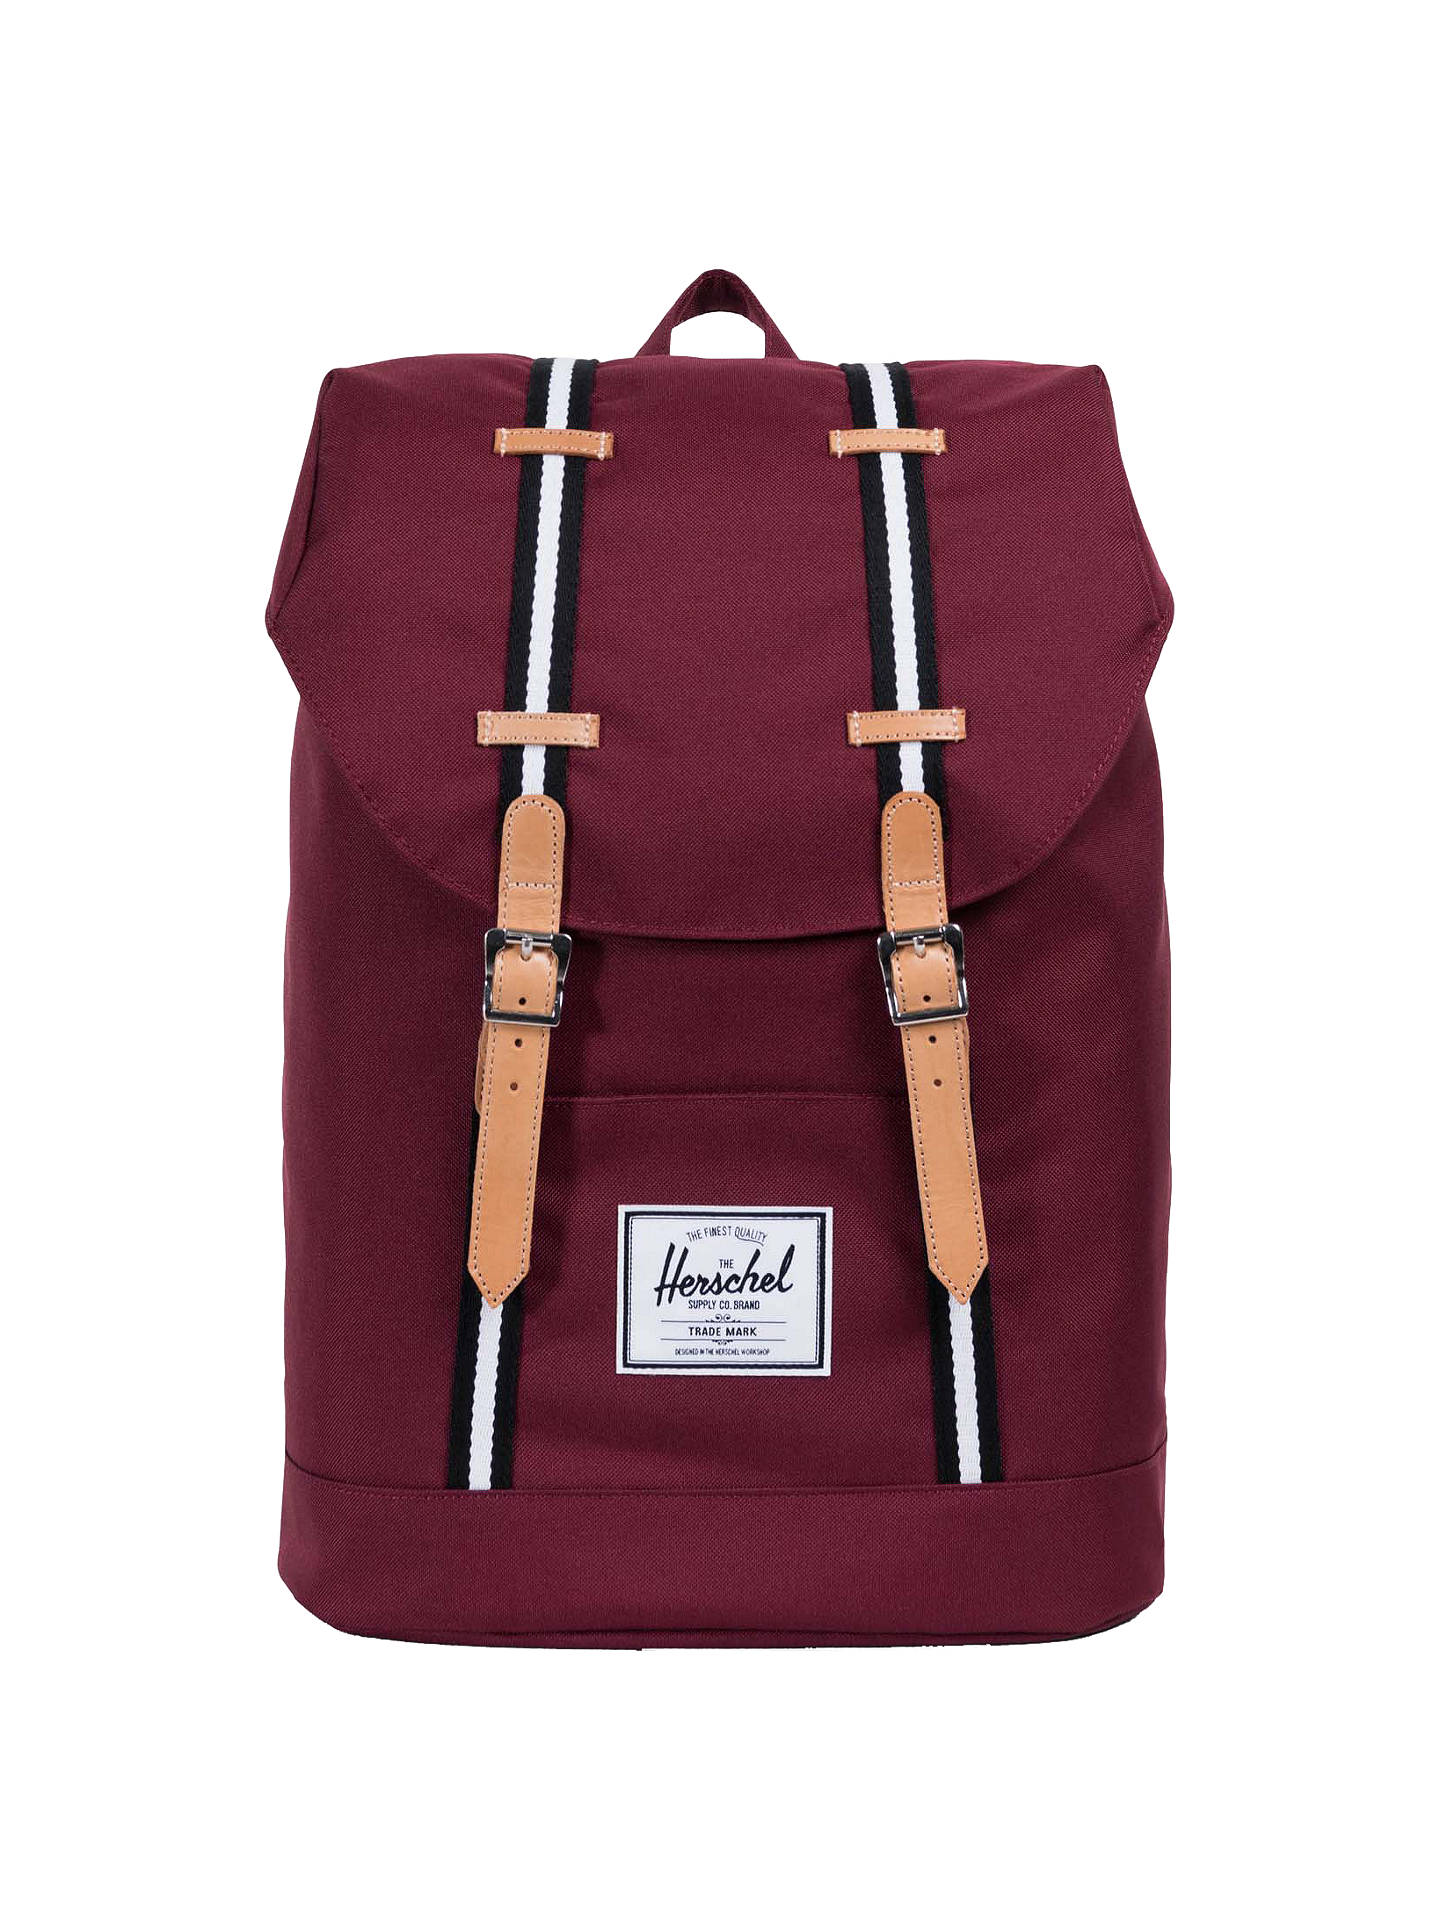 3675b9df9 Buy Herschel Supply Co. Retreat Backpack, Windsor Wine Stripe Online at  johnlewis.com ...